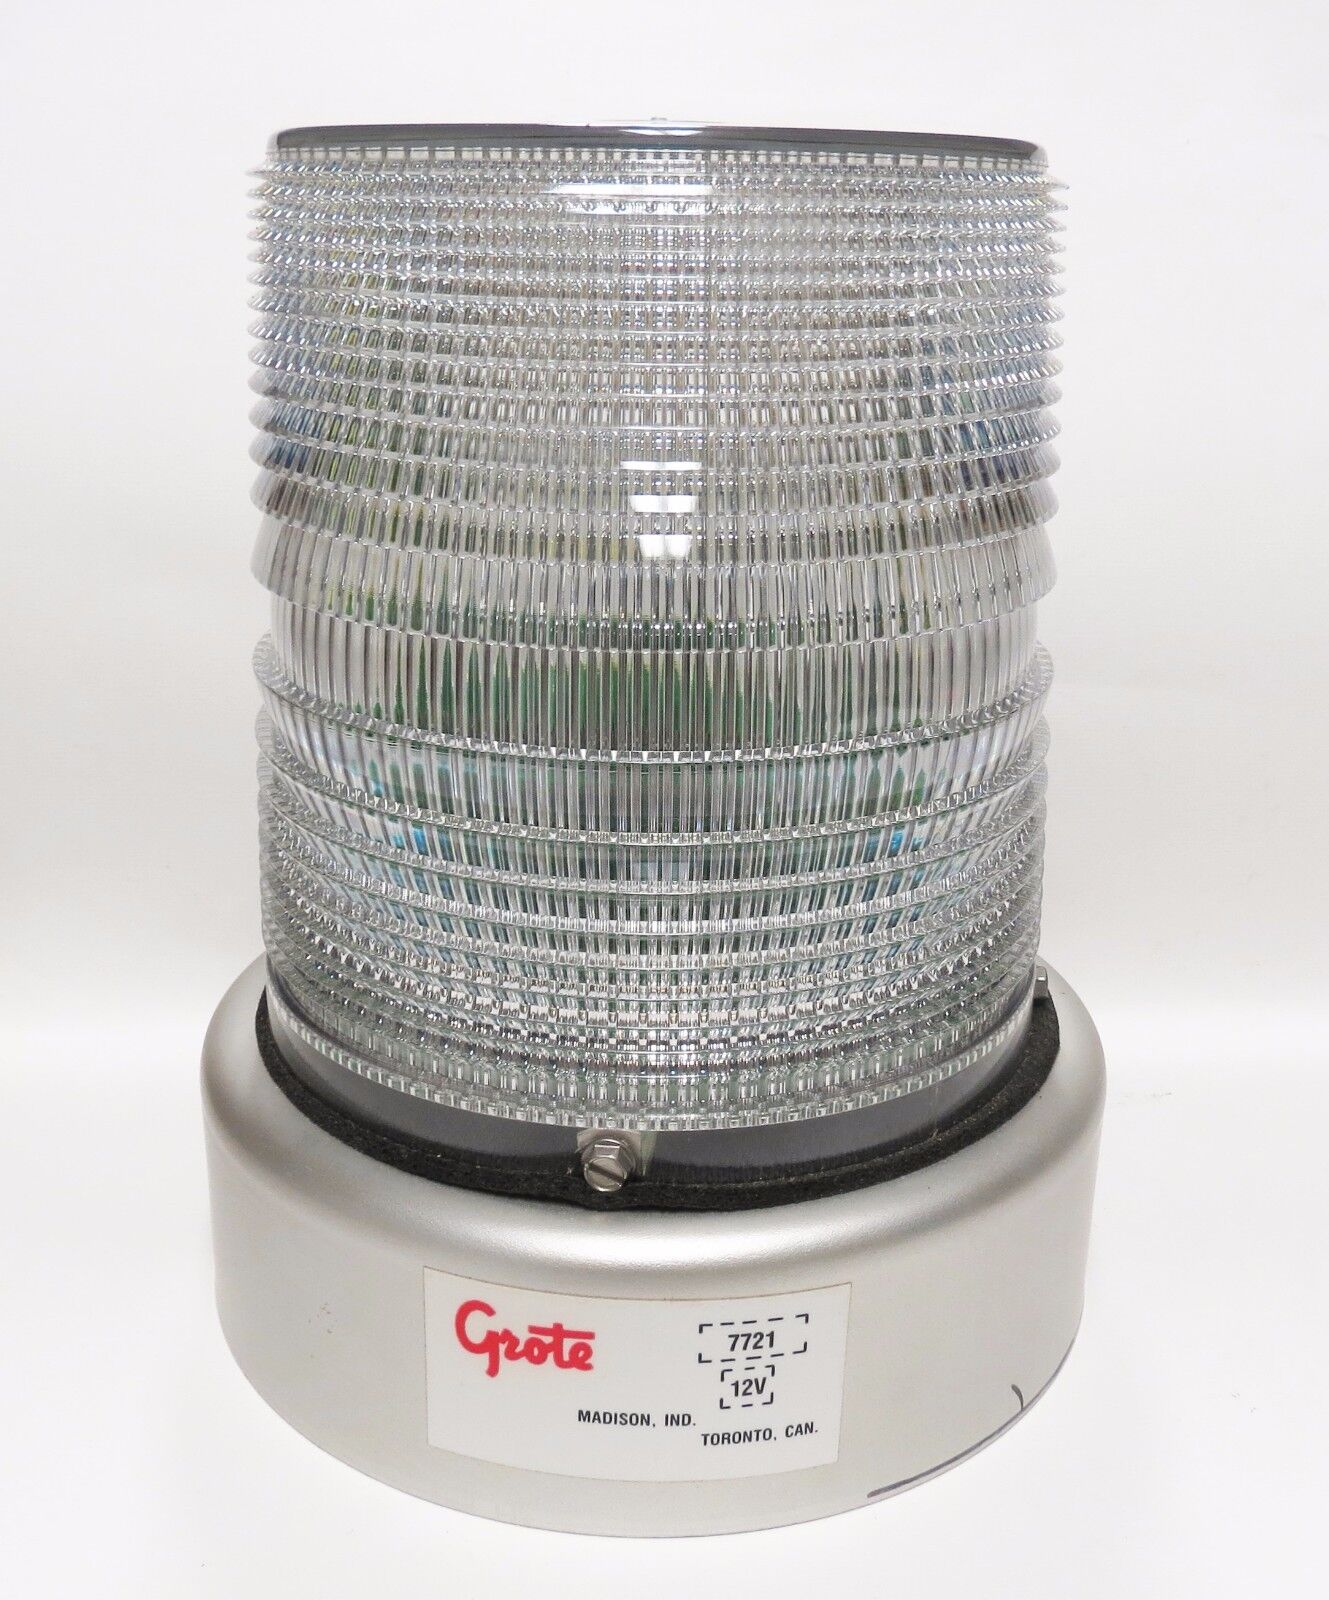 Grote Strobe Light 7721